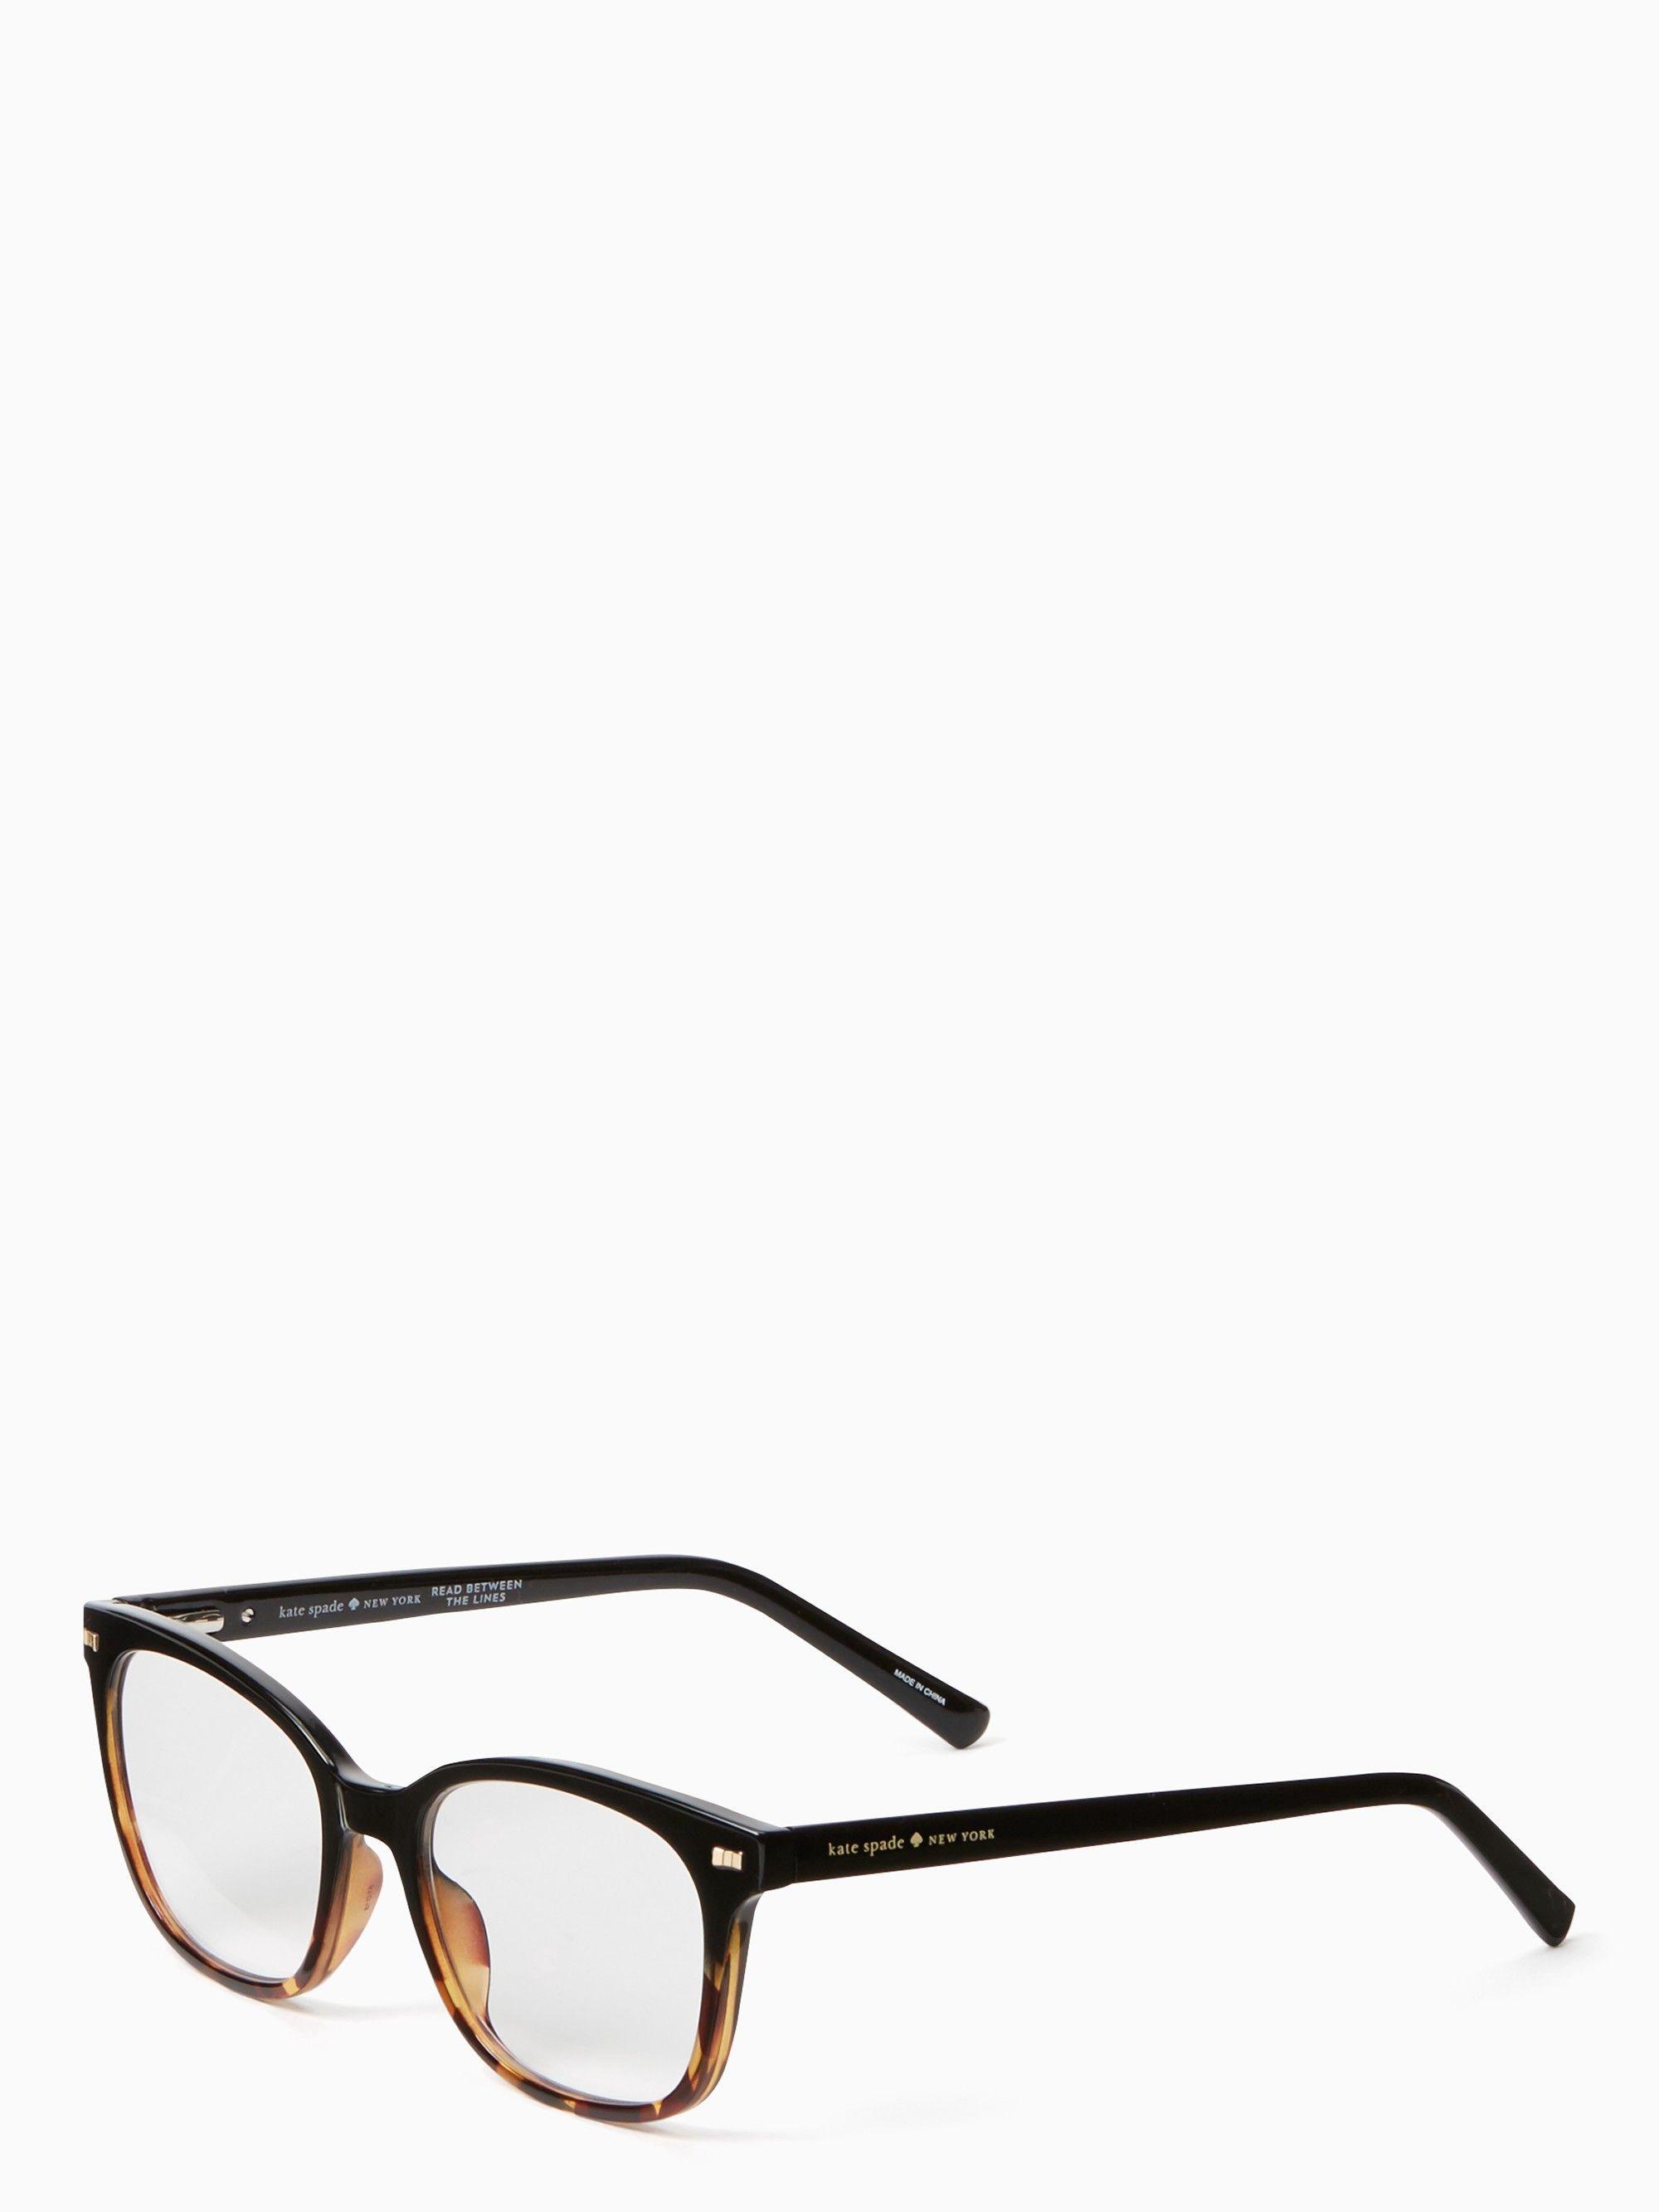 4c1b3c19856 KATE SPADE Keadra Glasses.  katespade  all